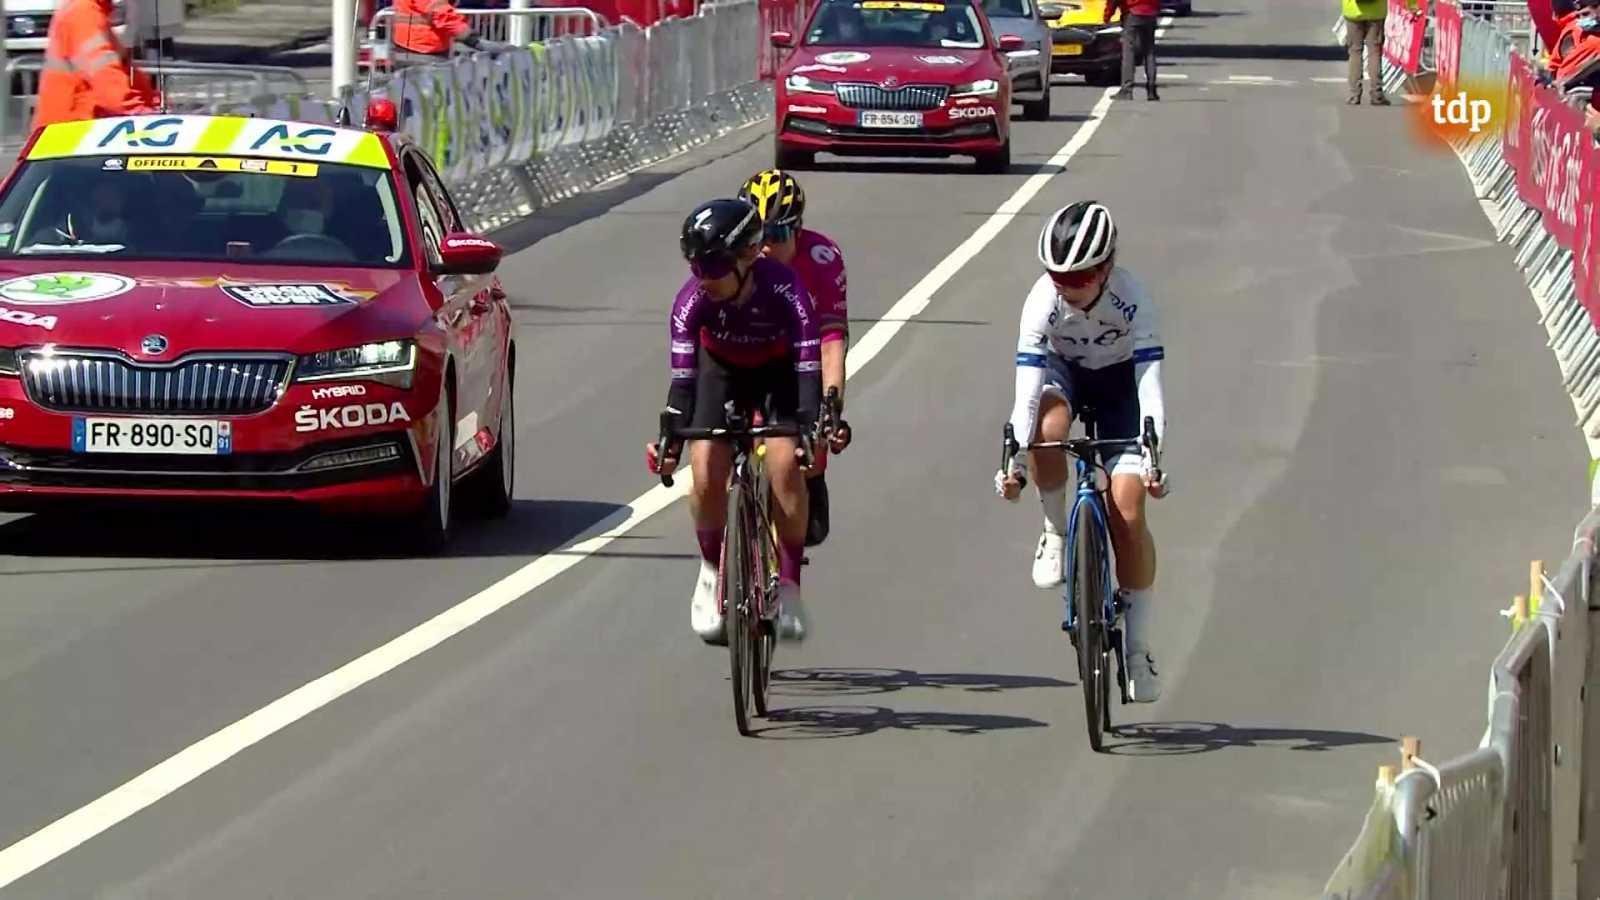 Ciclismo - Lieja-Bastogne-Lieja. Carrera femenina II - ver ahora